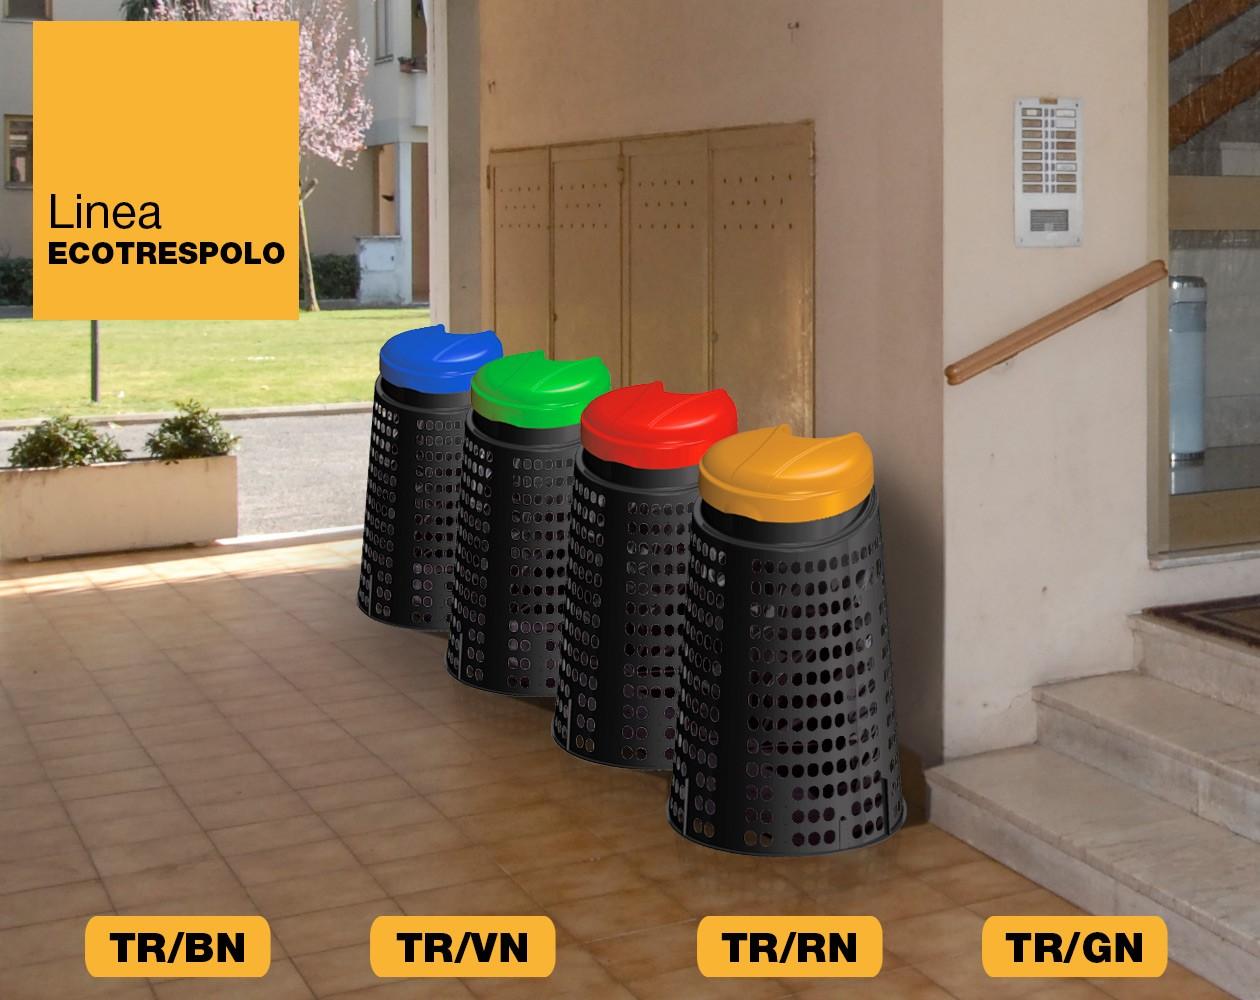 Trespolo rifiuti immondizia Linea Ecotrespolo Art Plast TR/BN, TR/VN, TR/RN, TR/GN